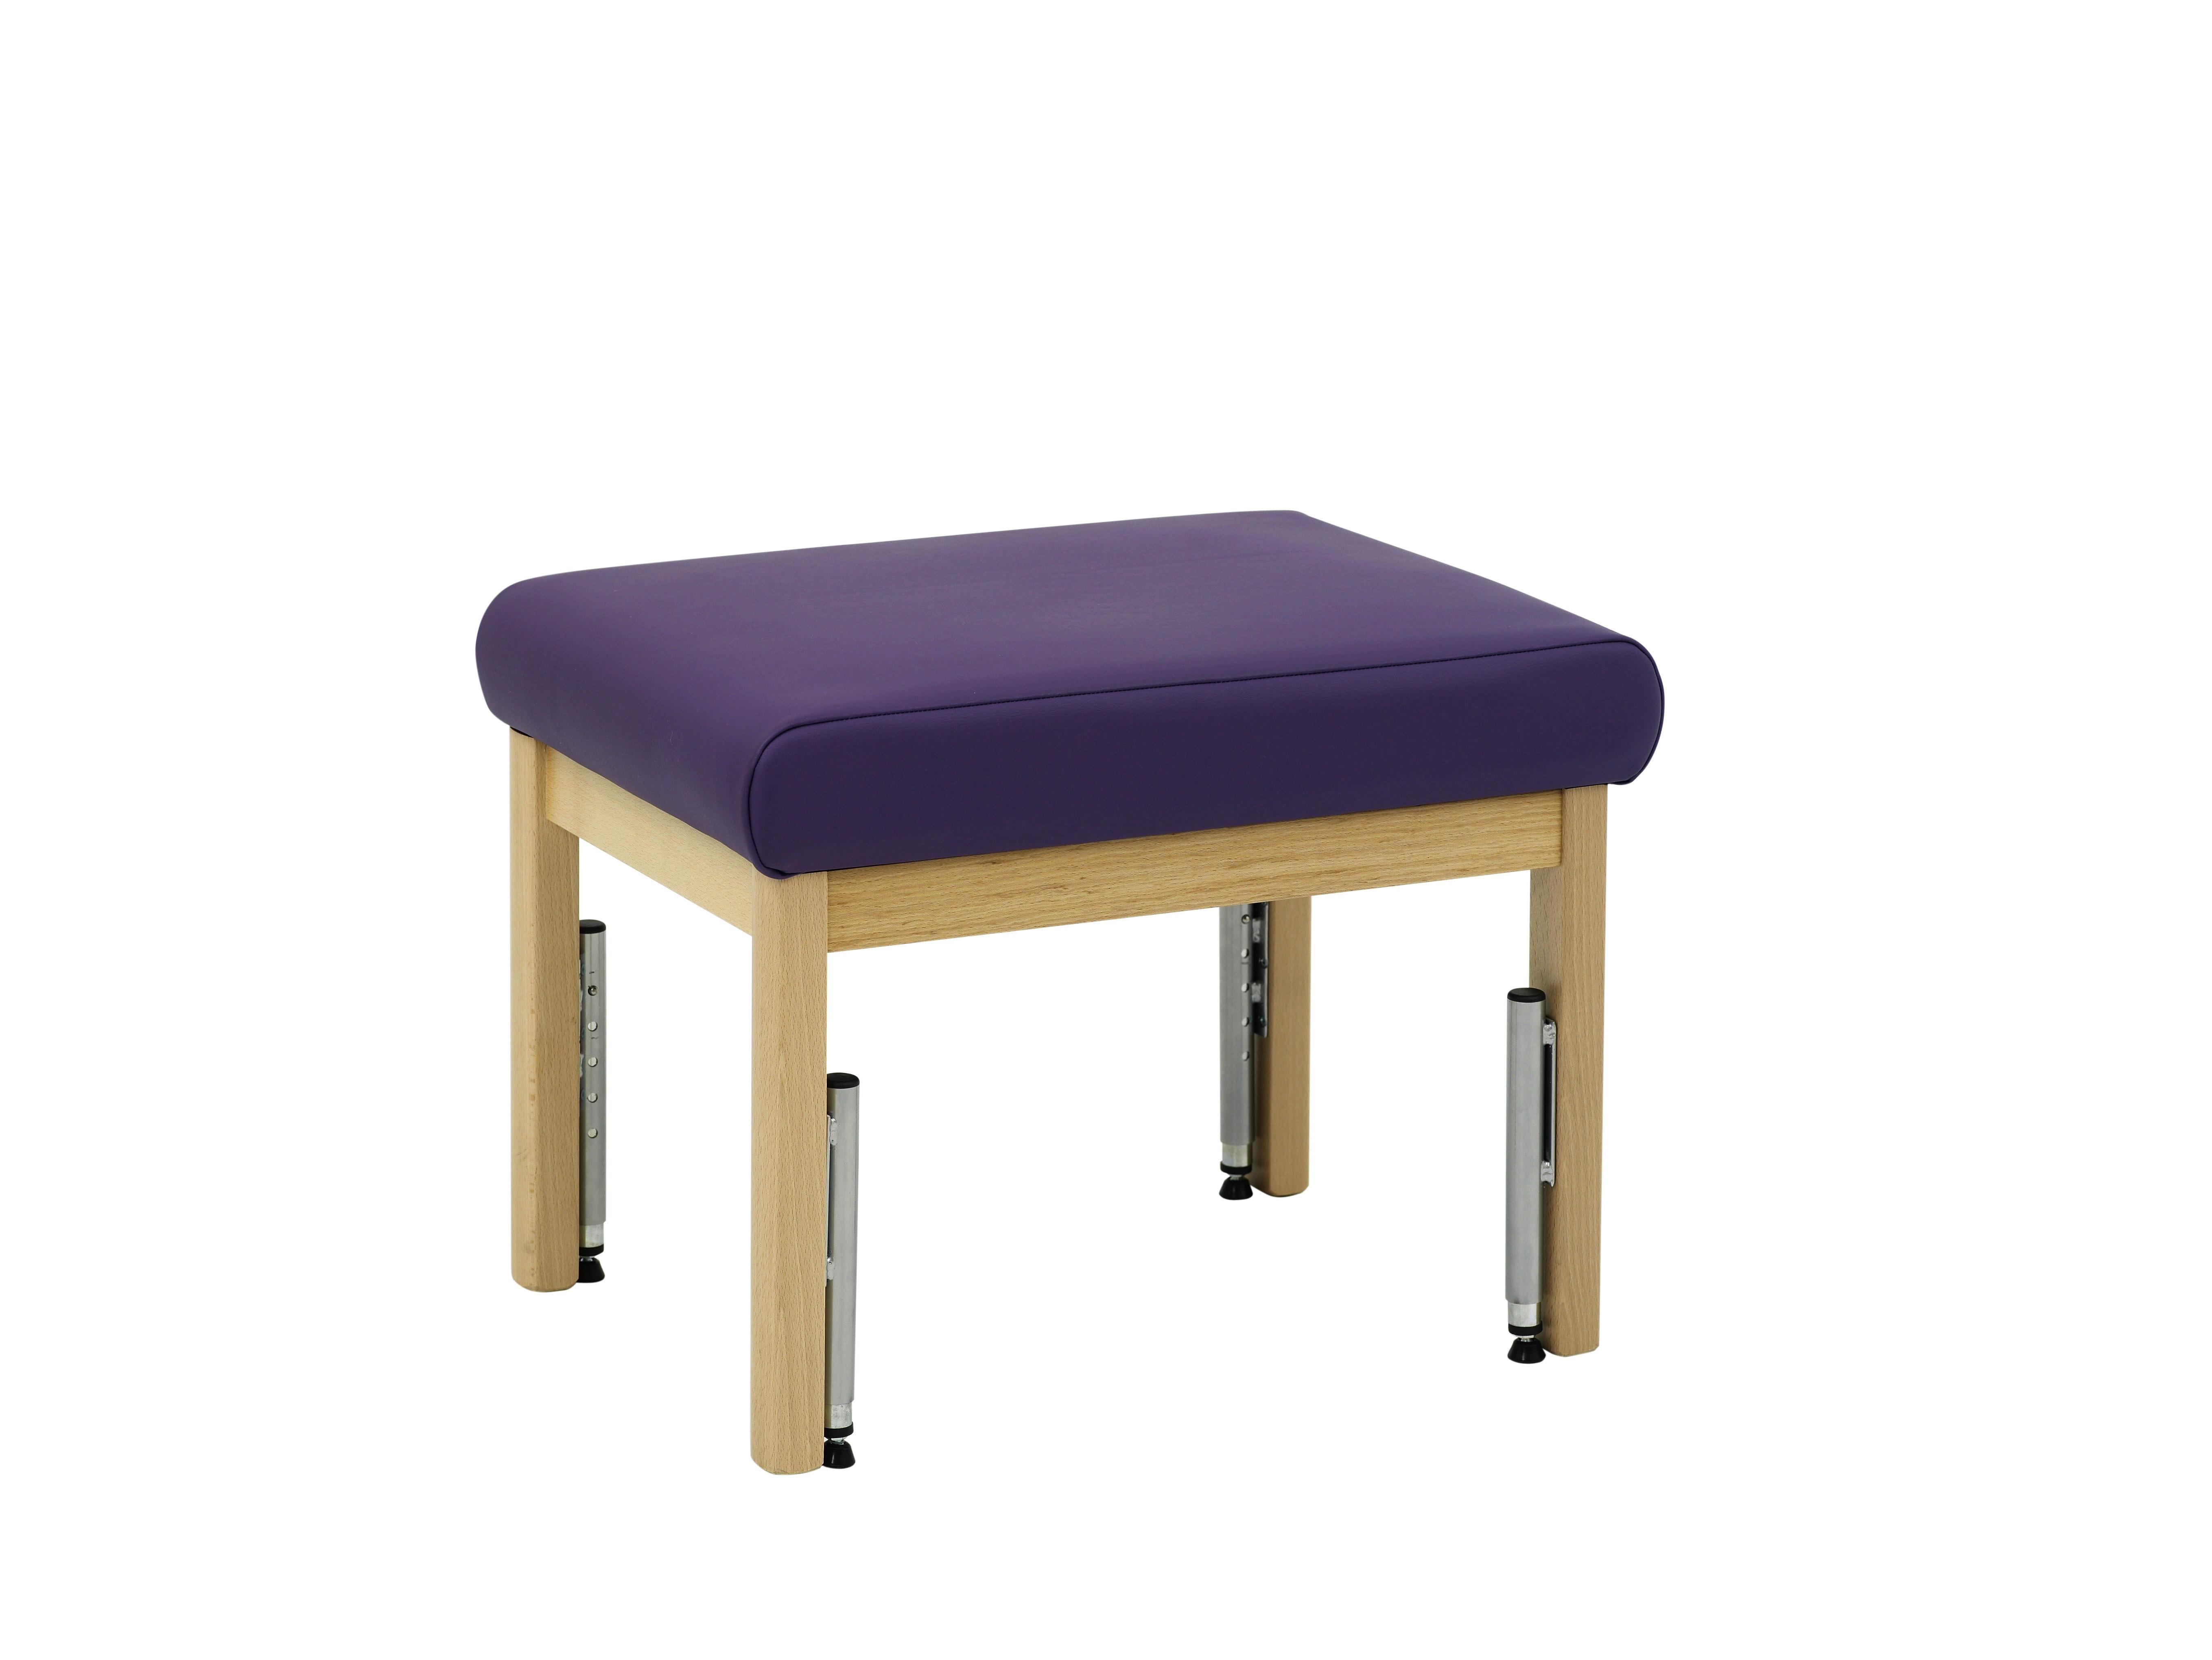 Astounding Dalton Foot Stool Patient Furniture Knightsbridge Furniture Ncnpc Chair Design For Home Ncnpcorg